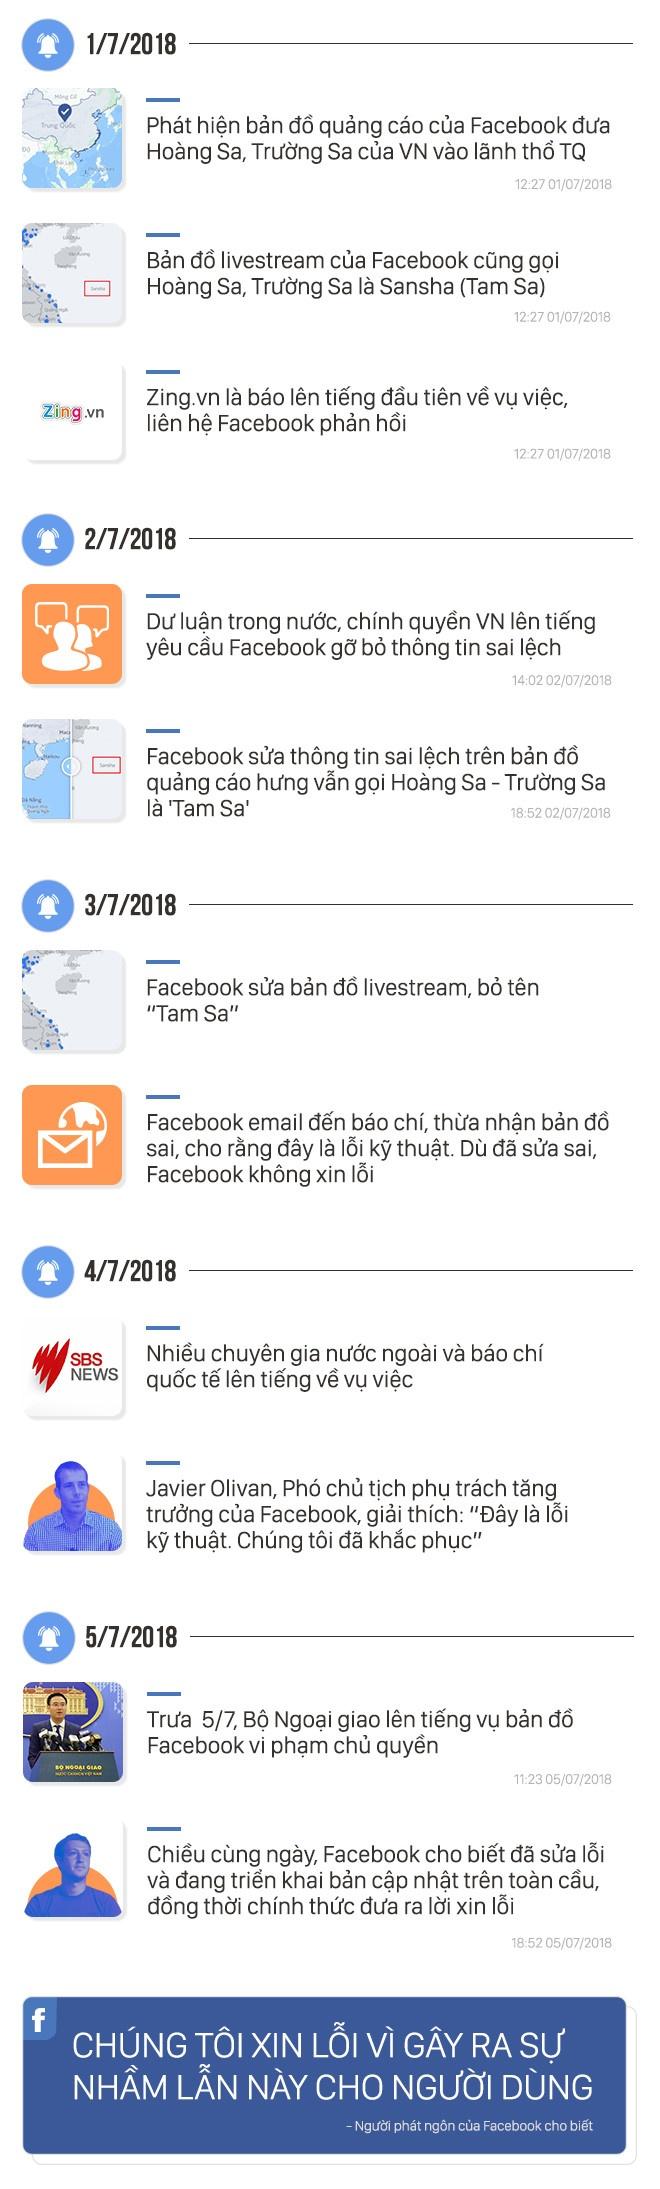 Thu tuong yeu cau giam sat viec Facebook xu ly vu cung cap ban do sai hinh anh 2